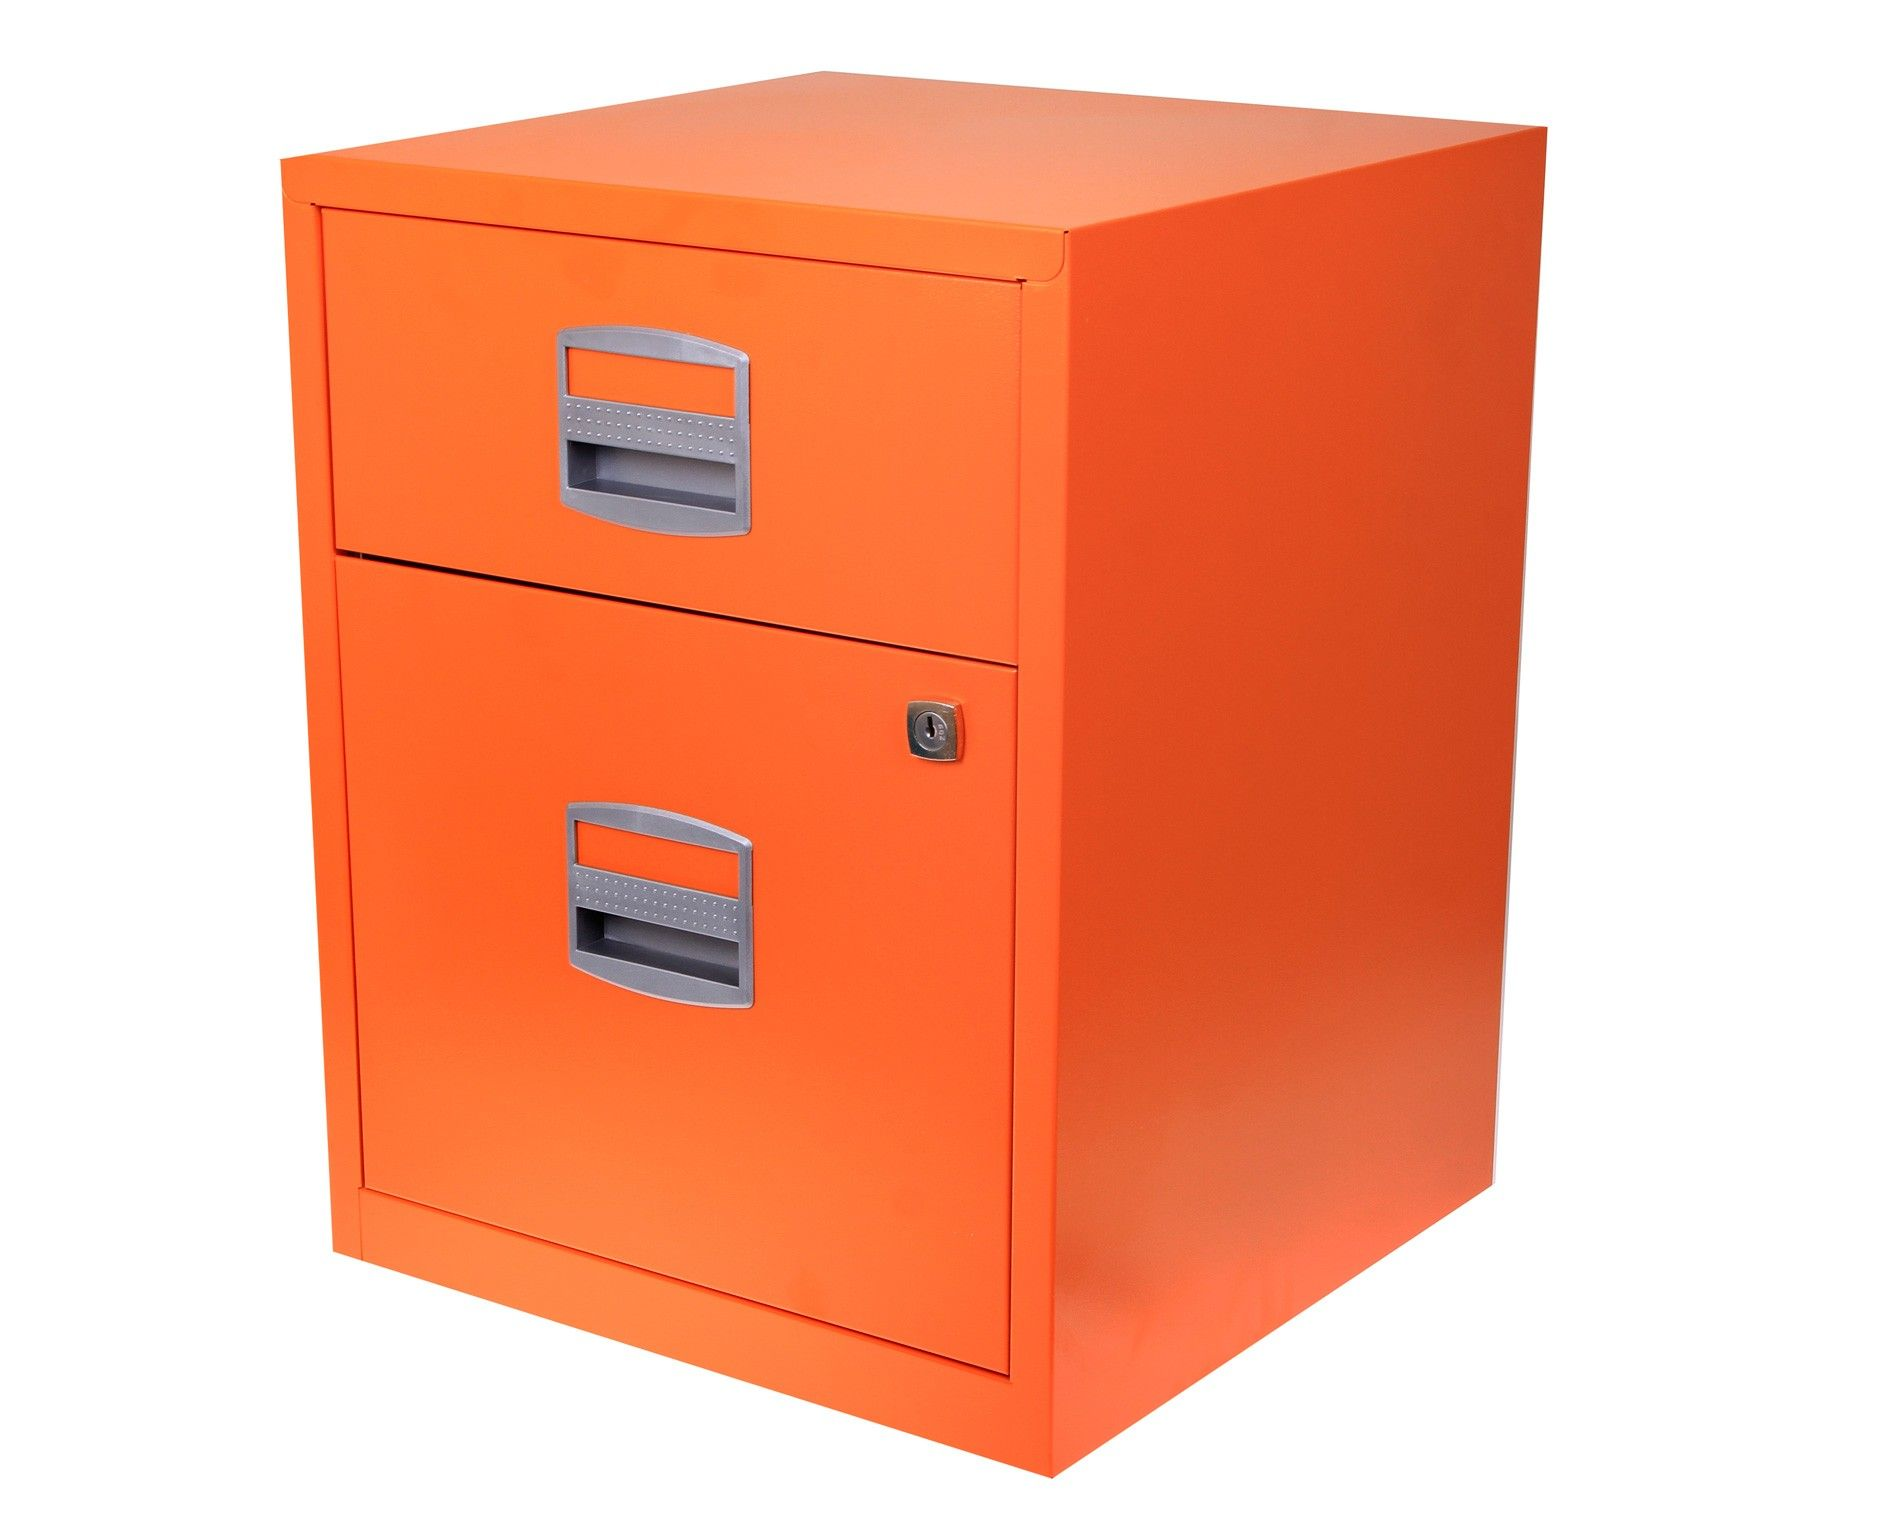 Bisley A4 2 Drawer Filing Cabinet On Wheels Filing Cabinet Drawer Filing Cabinet Steel Filing Cabinet